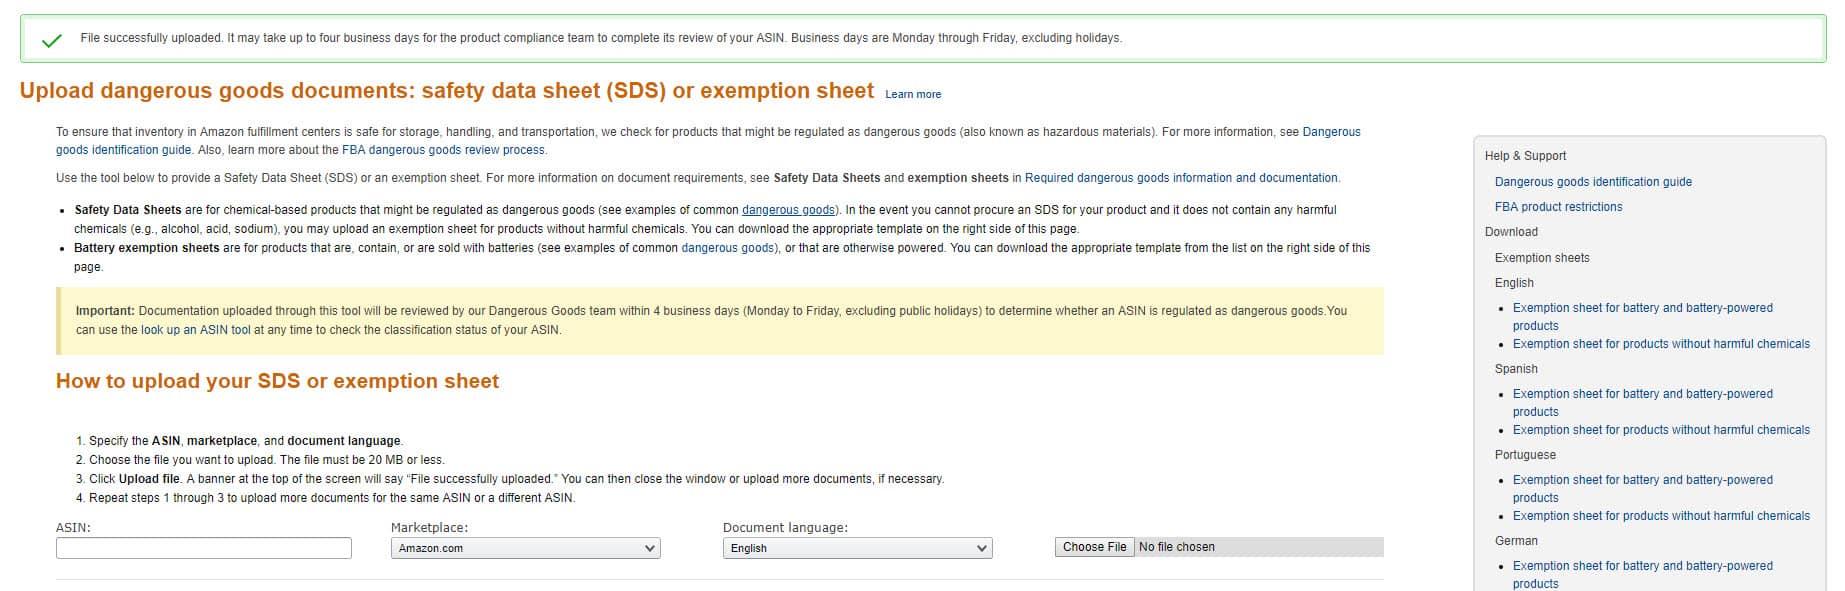 exemption sheet invalid file format amazon seller central hazmat dangerous goods upload error fix resolved solved